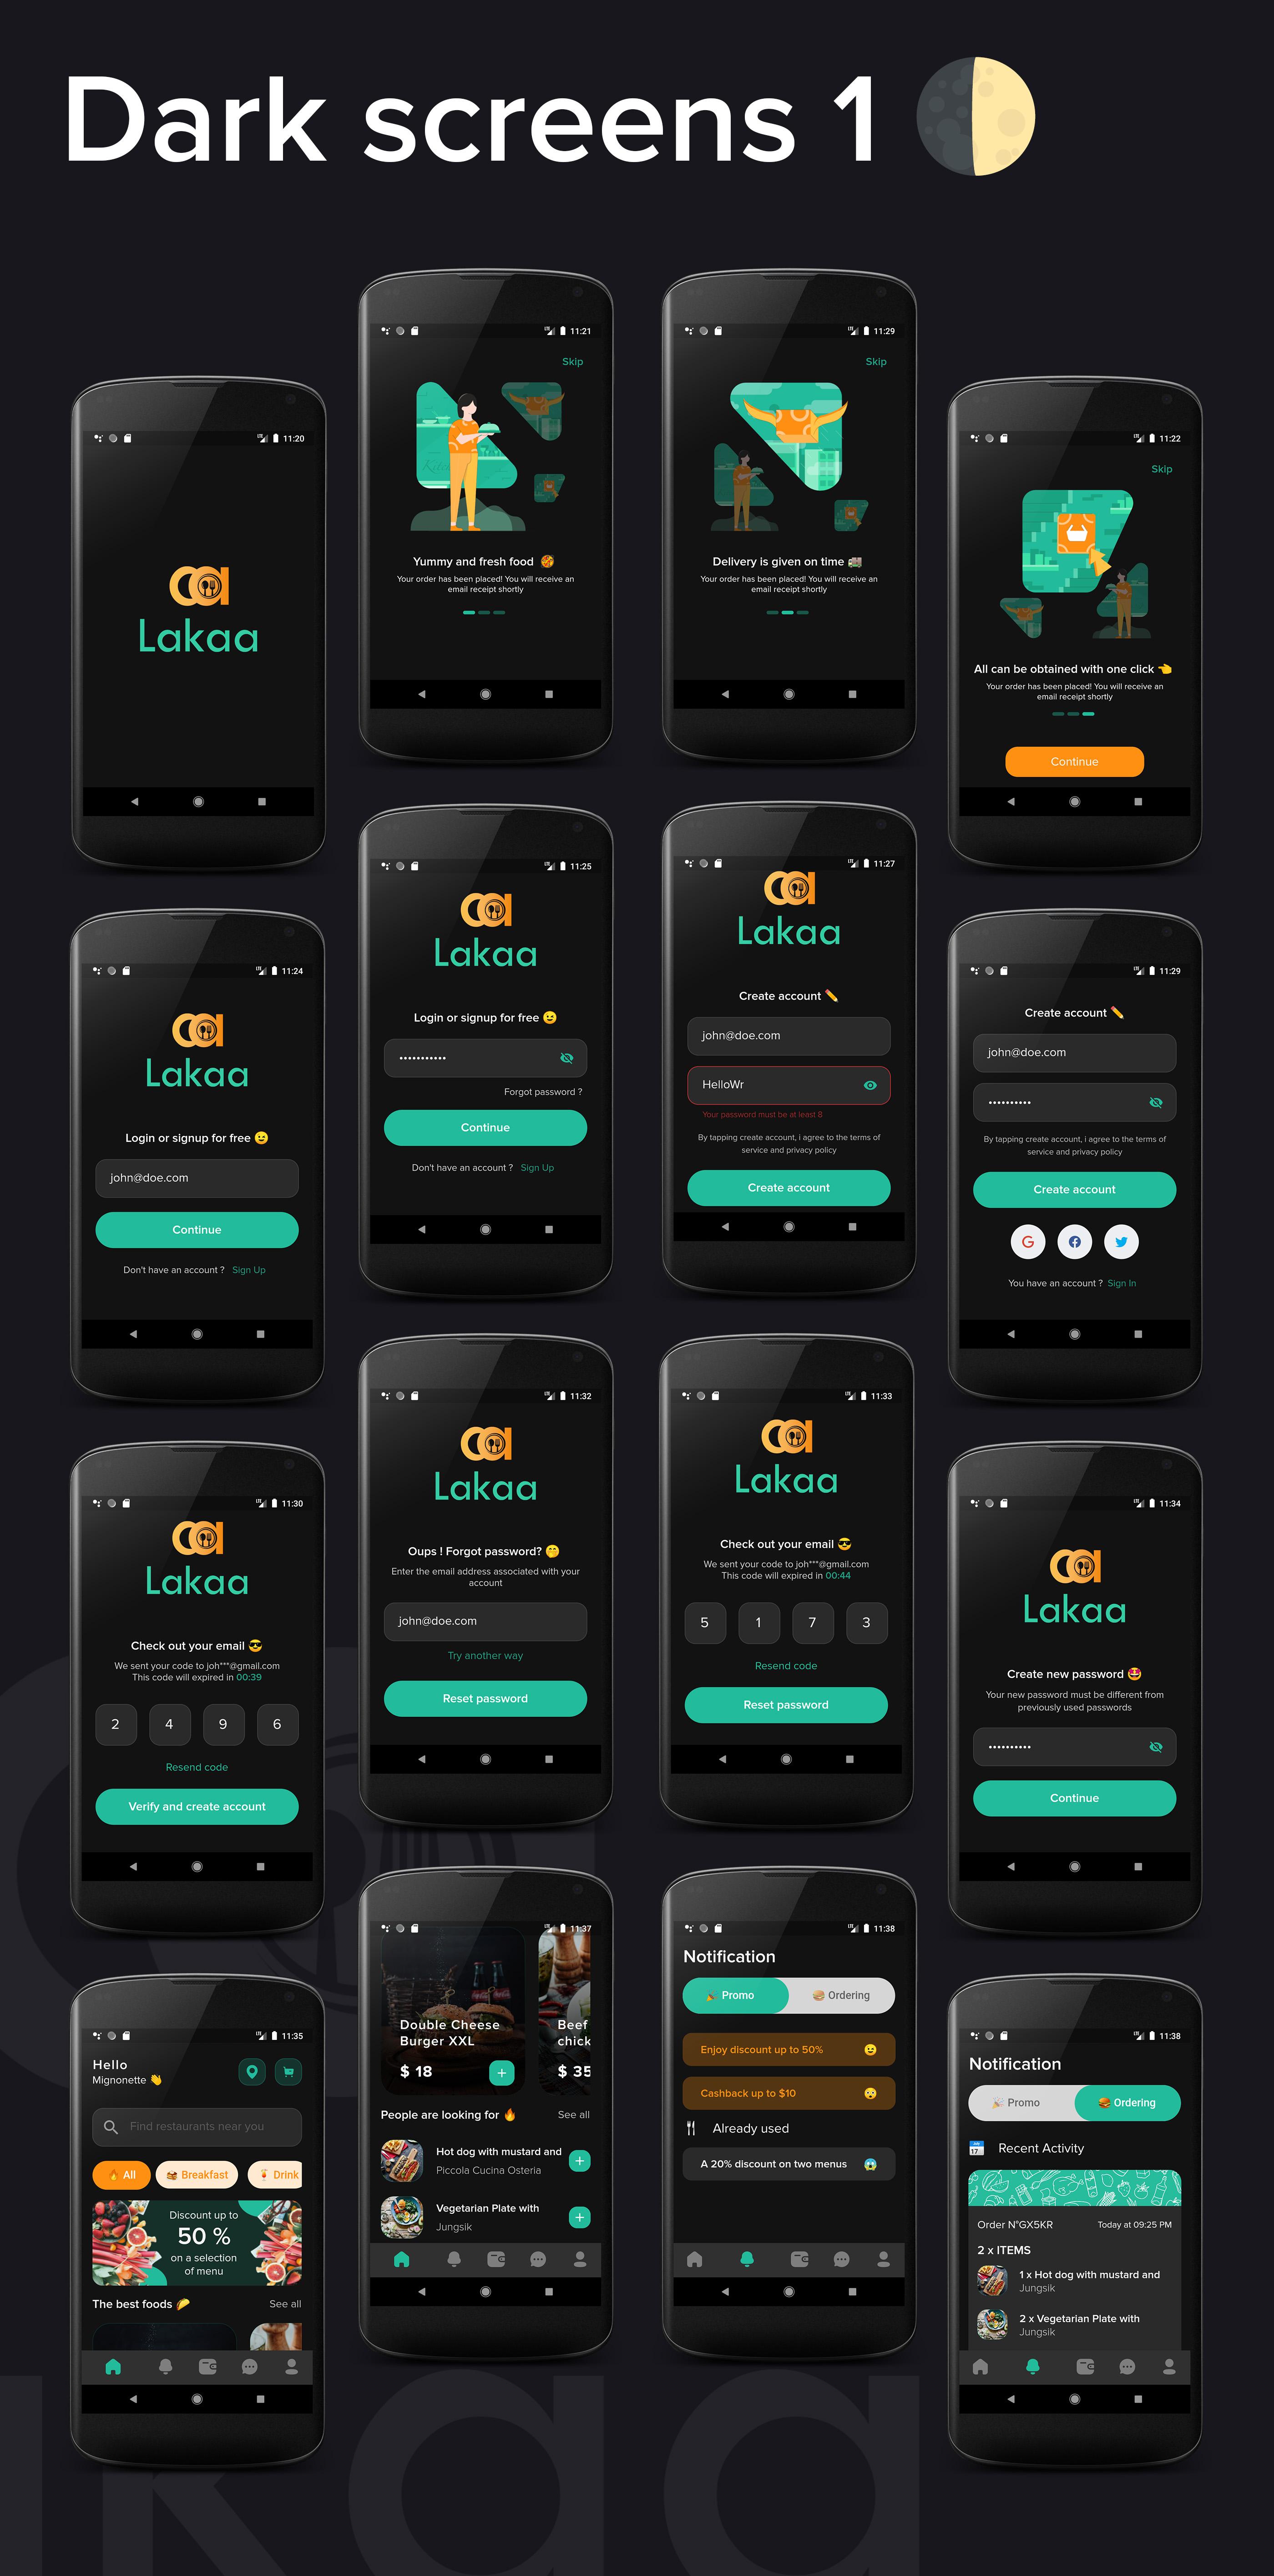 Lakaa food delivery app dark mode screens 1 - flutter ui kit design